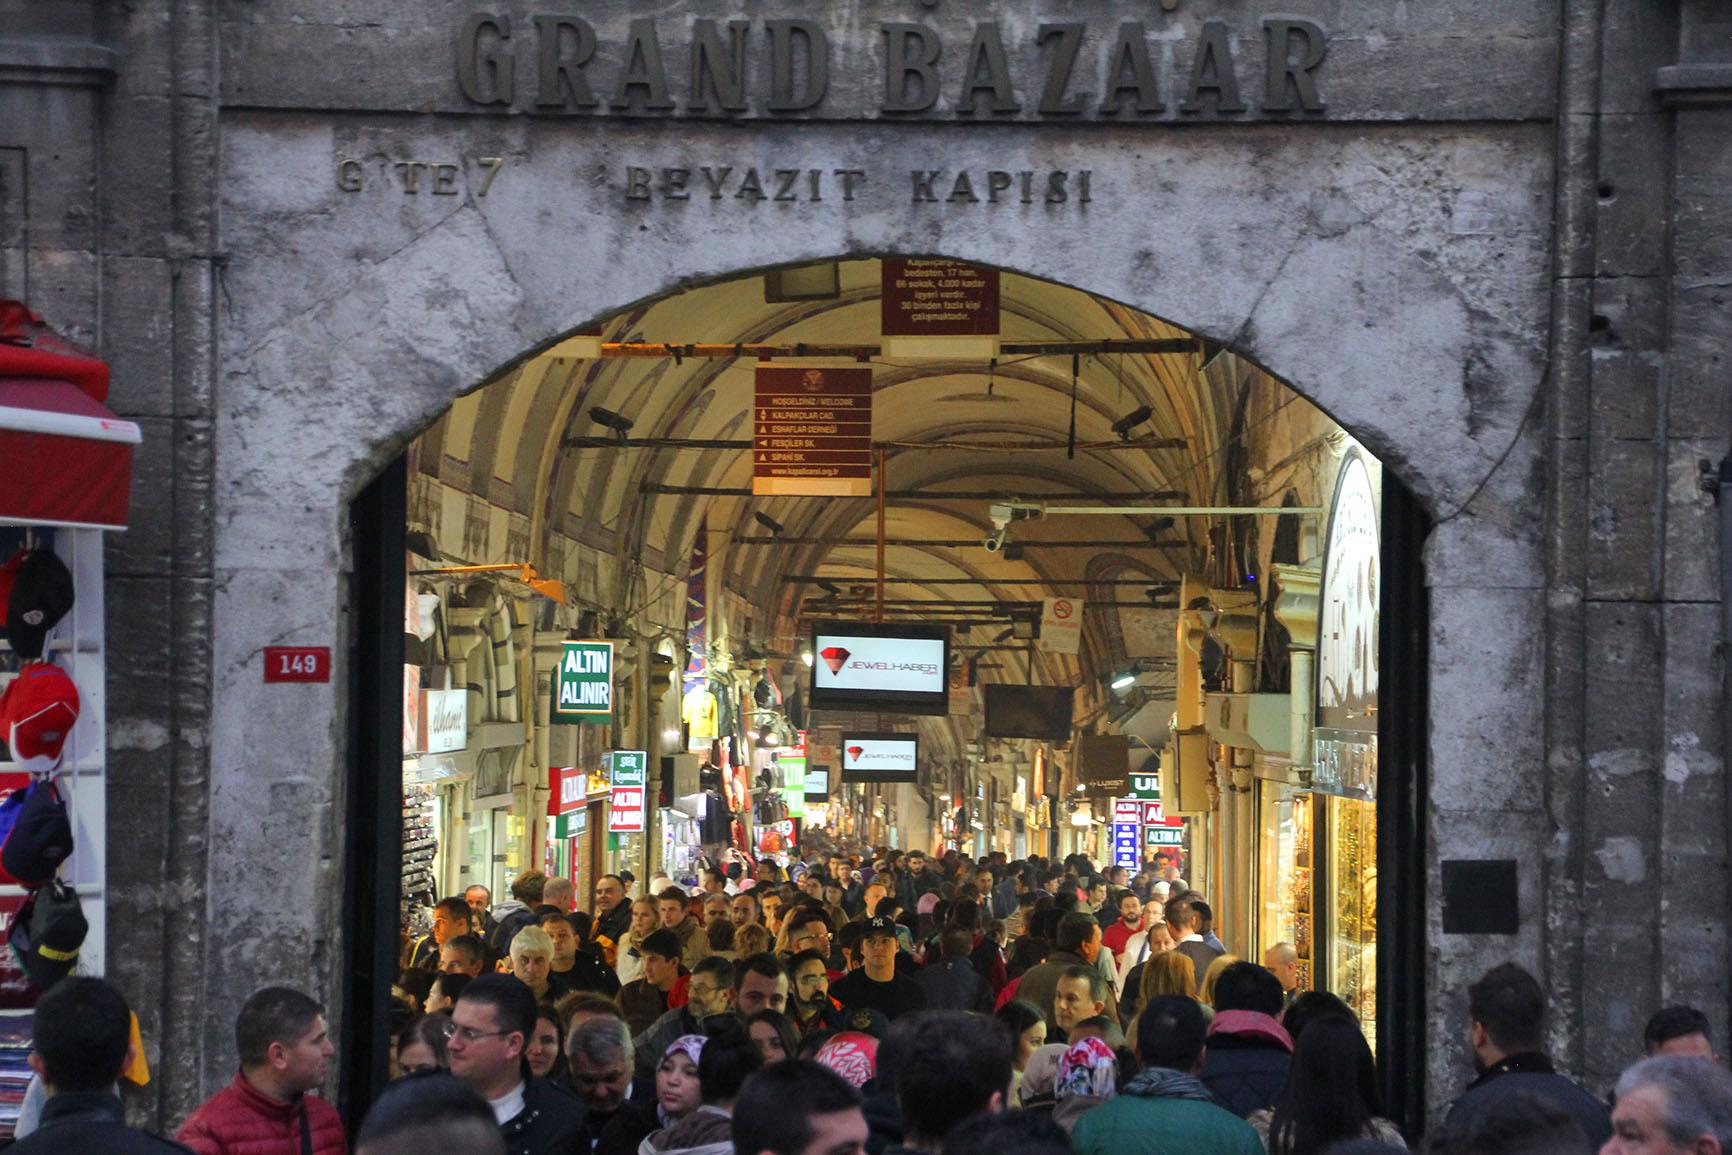 Grand Bazaar Istanbul Turkey 25 02 18 Jonovernon